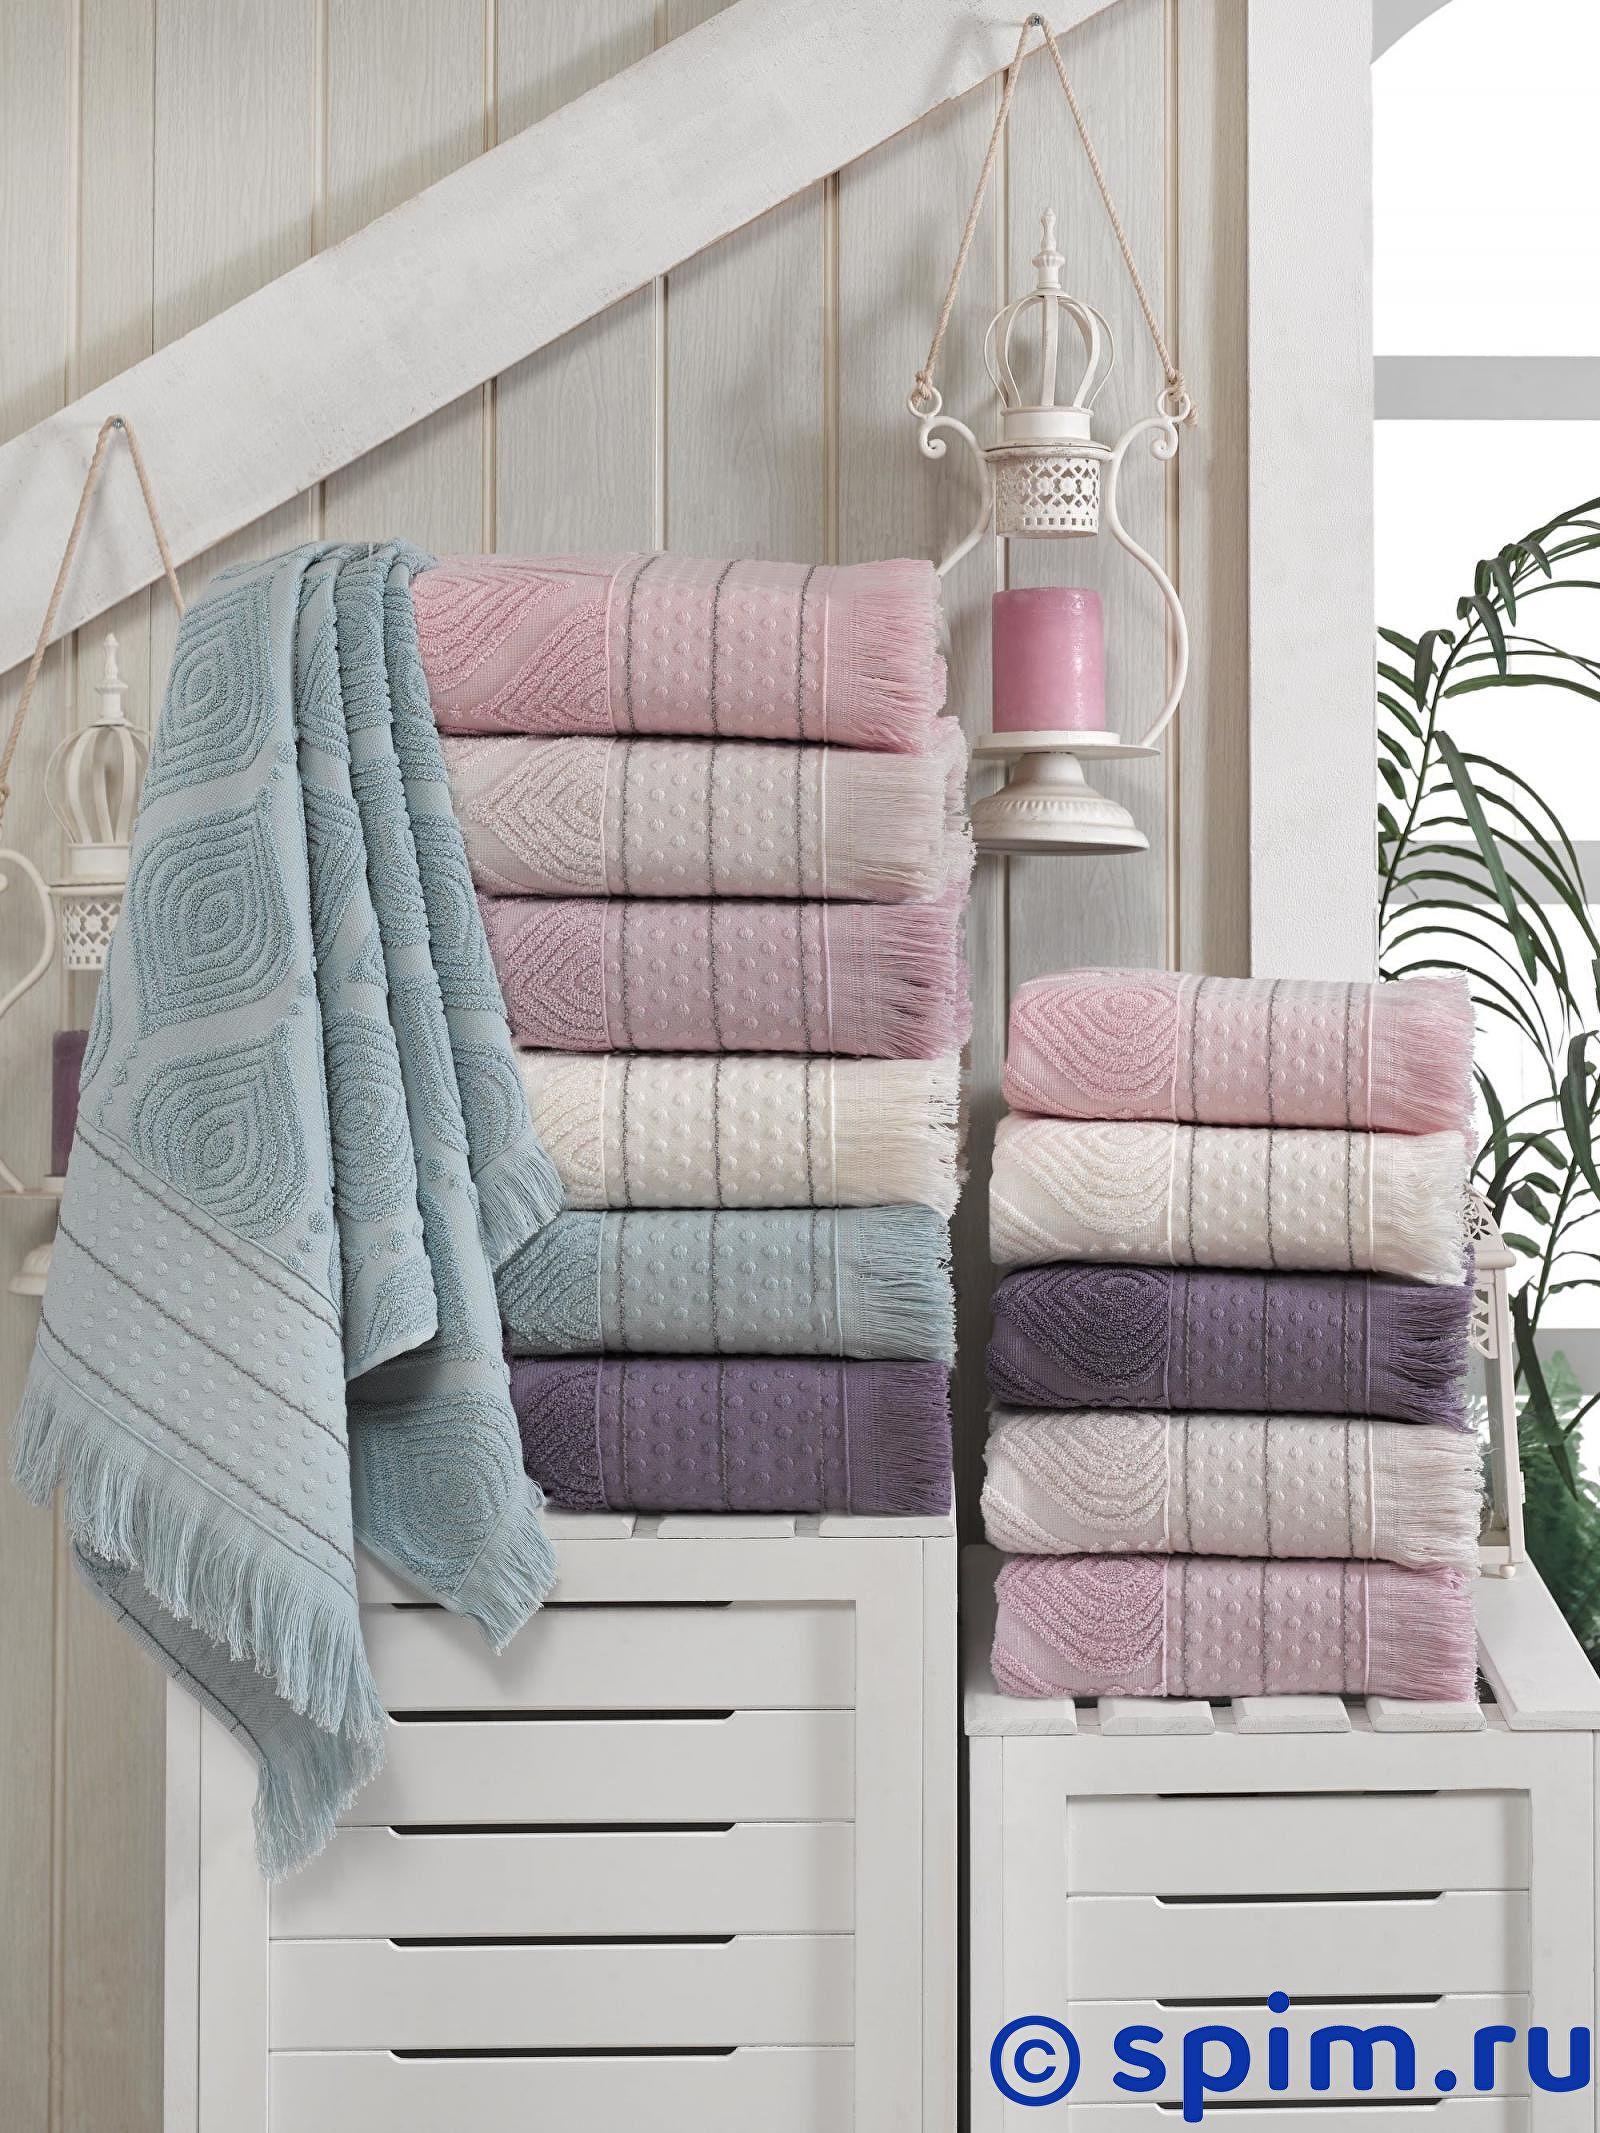 Полотенце Do&co Noktali 70х140 см (6 шт.) 70х140 см полотенца do n co полотенце lady цвет мятный набор